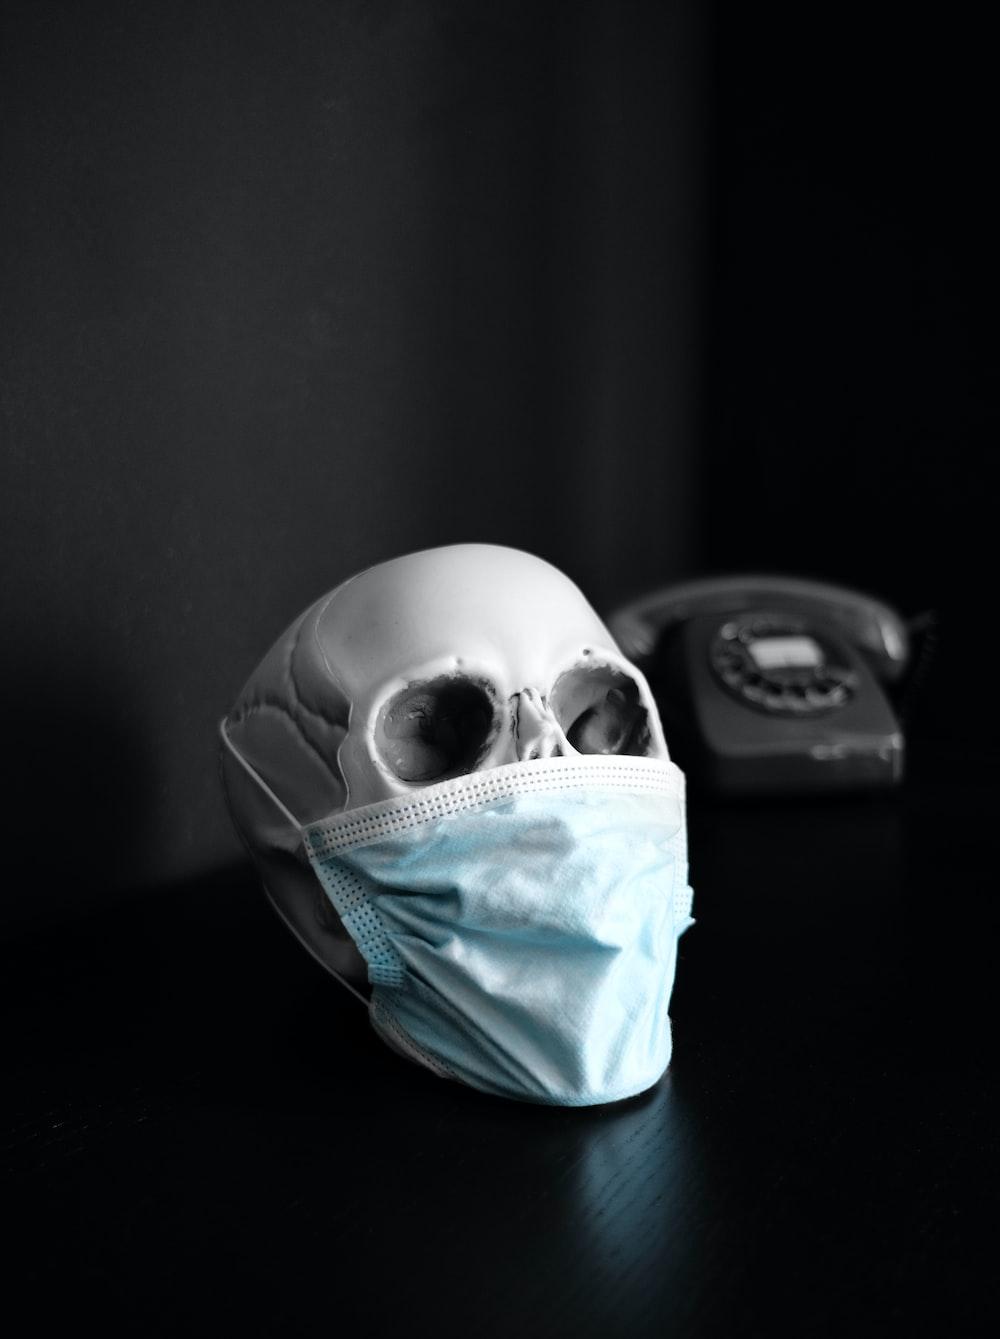 white and blue skull on black surface